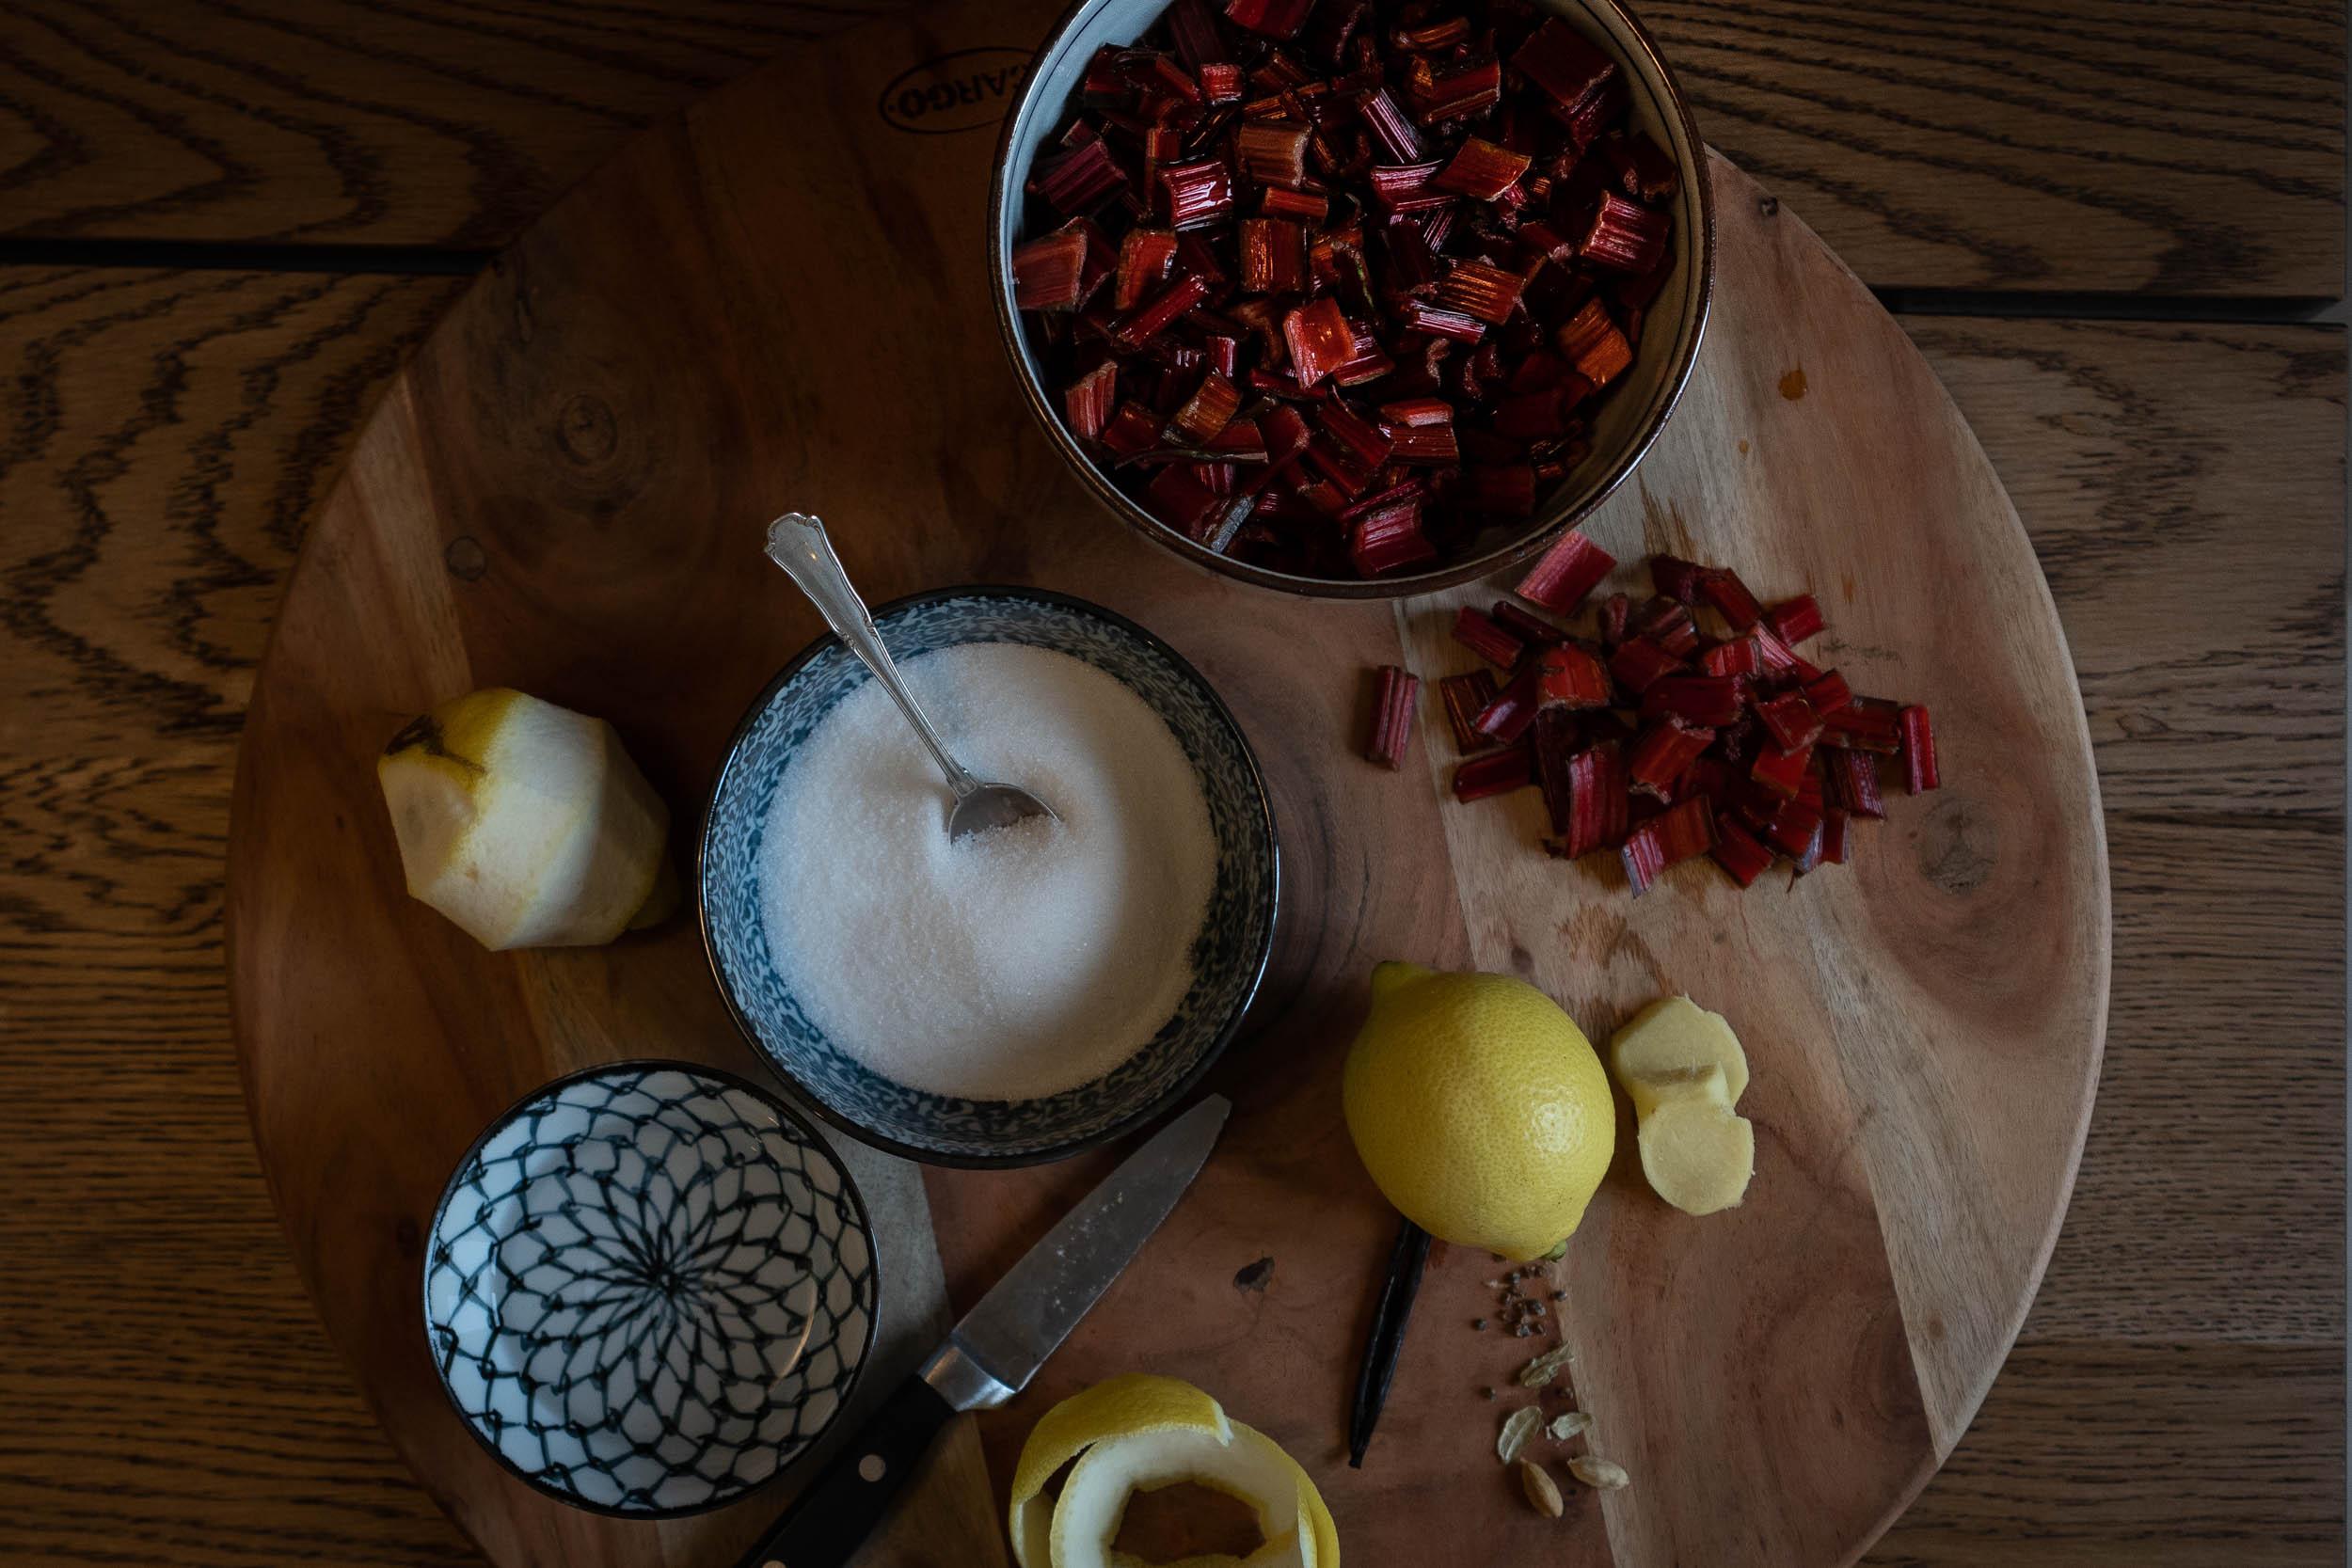 Rhubarb-Jam-with-cardamom-and-ginger-05059.jpg